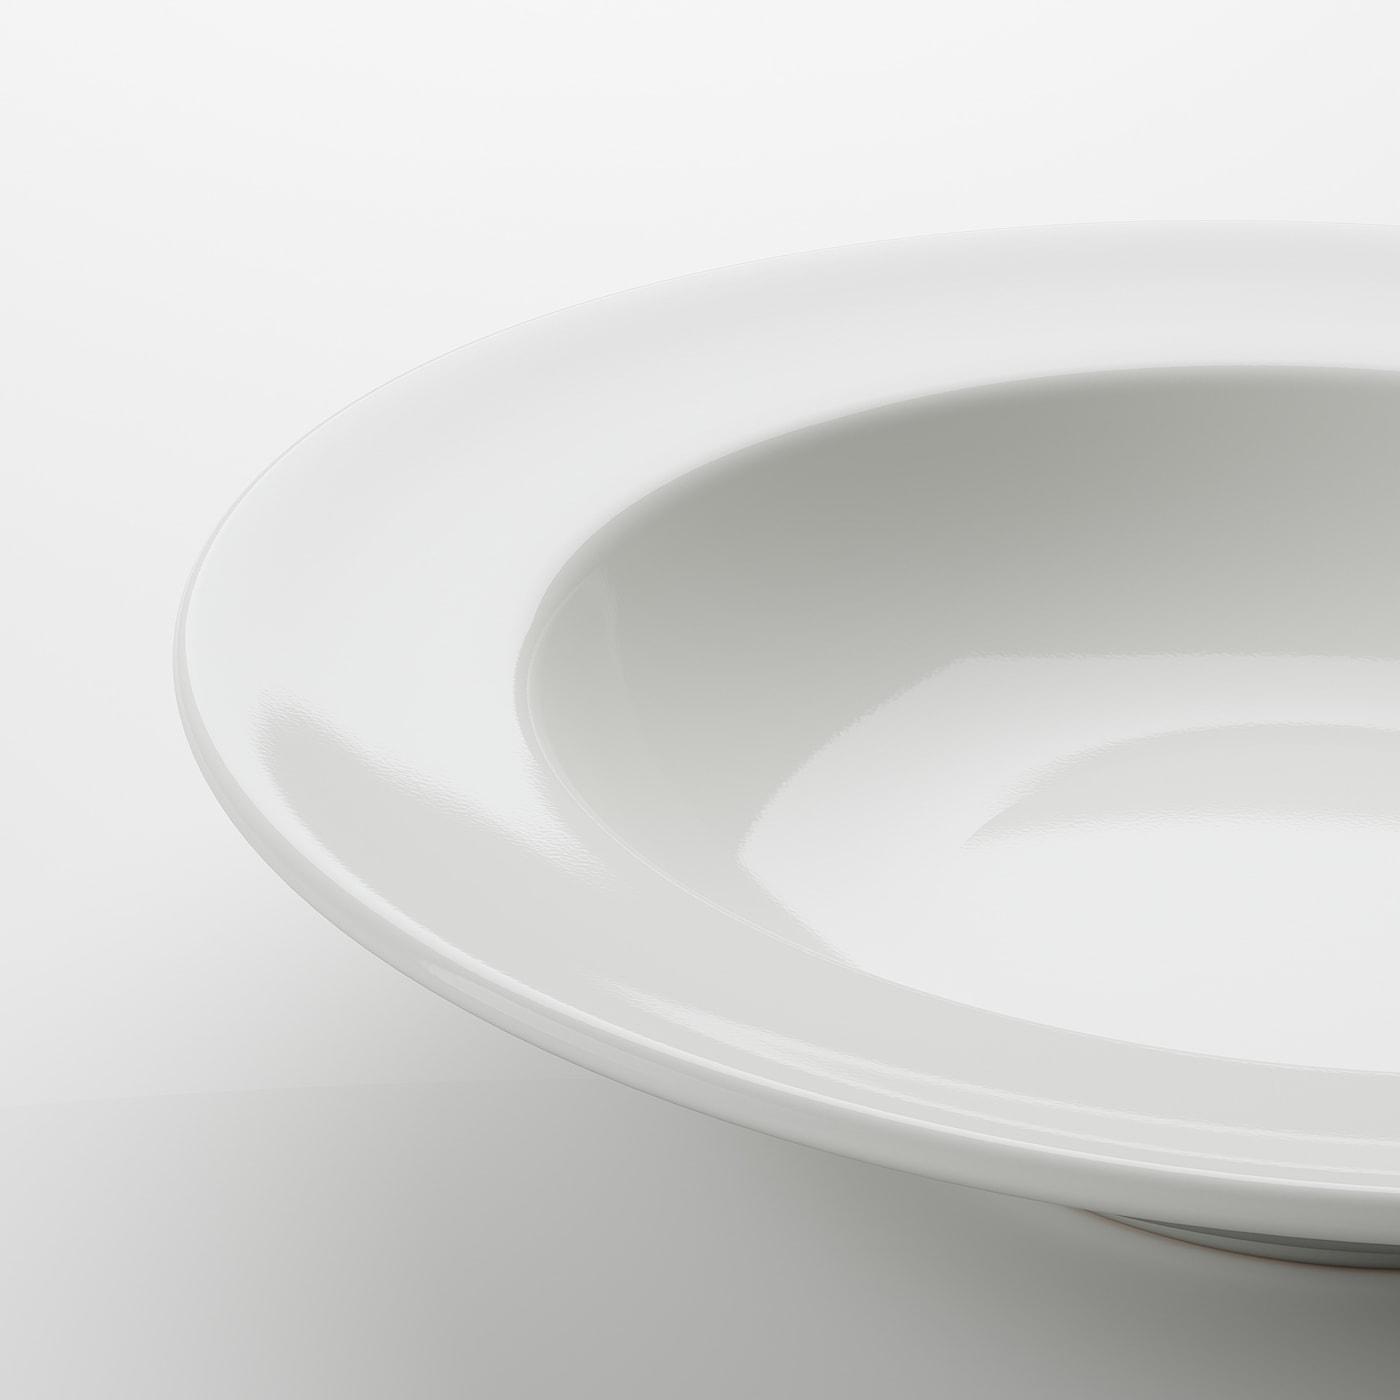 VARDAGEN Plater sakona, hezurra, 23 cm